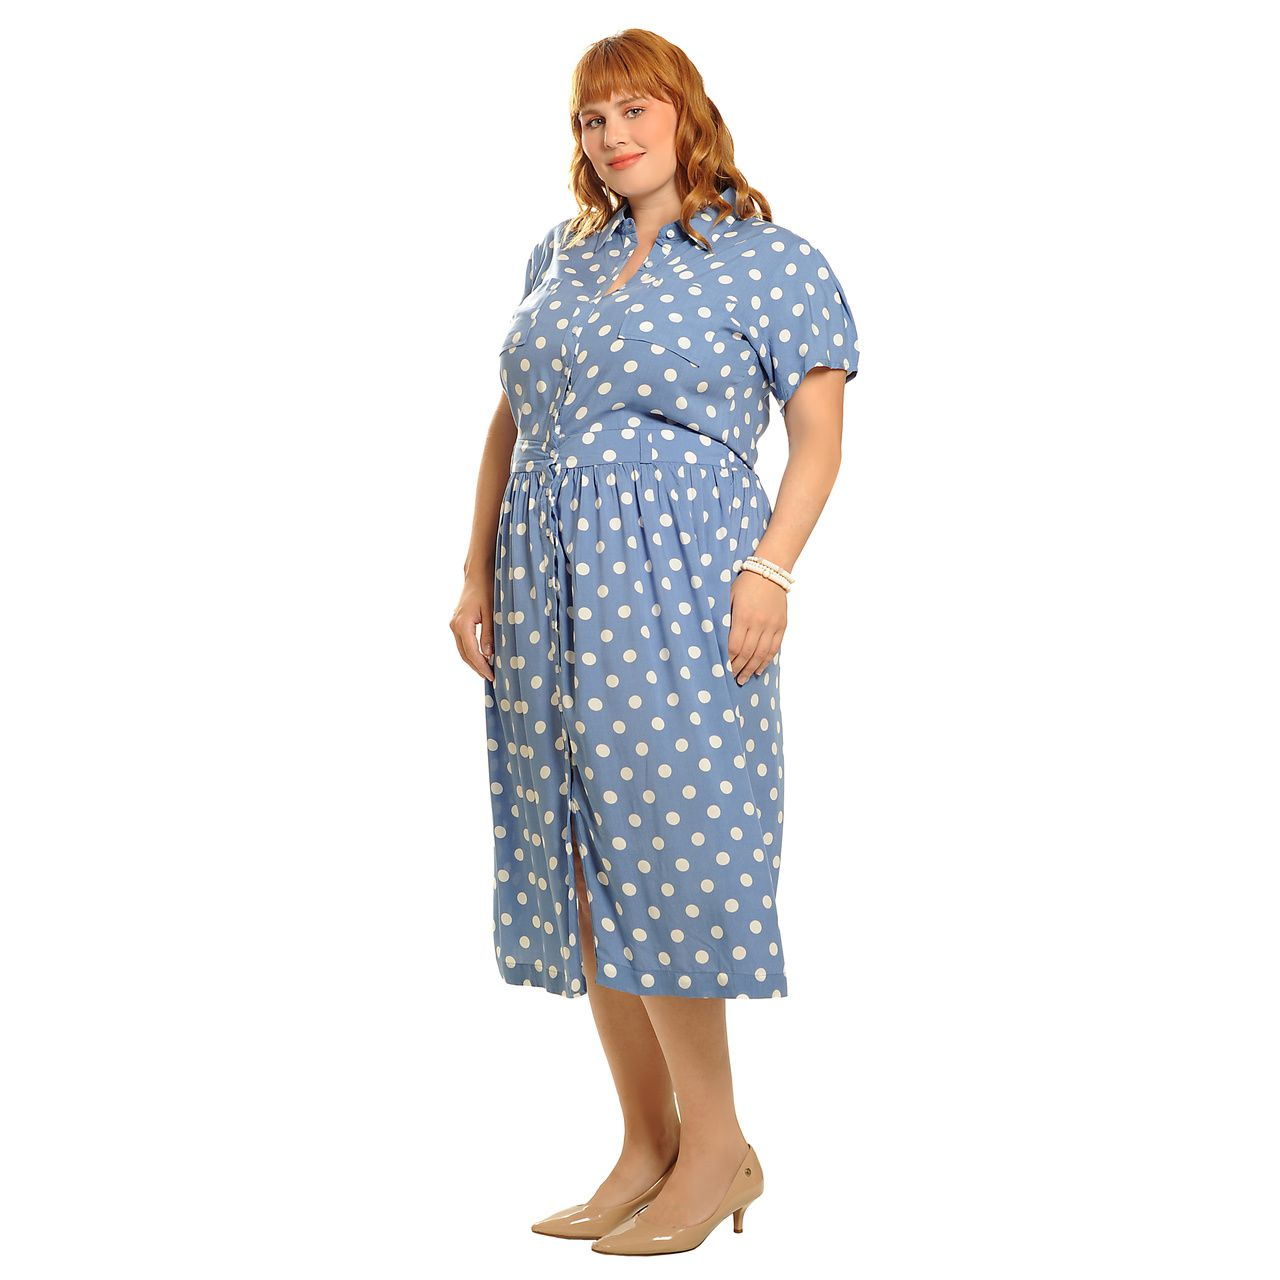 Vestido poá midi manga curta azul plus size